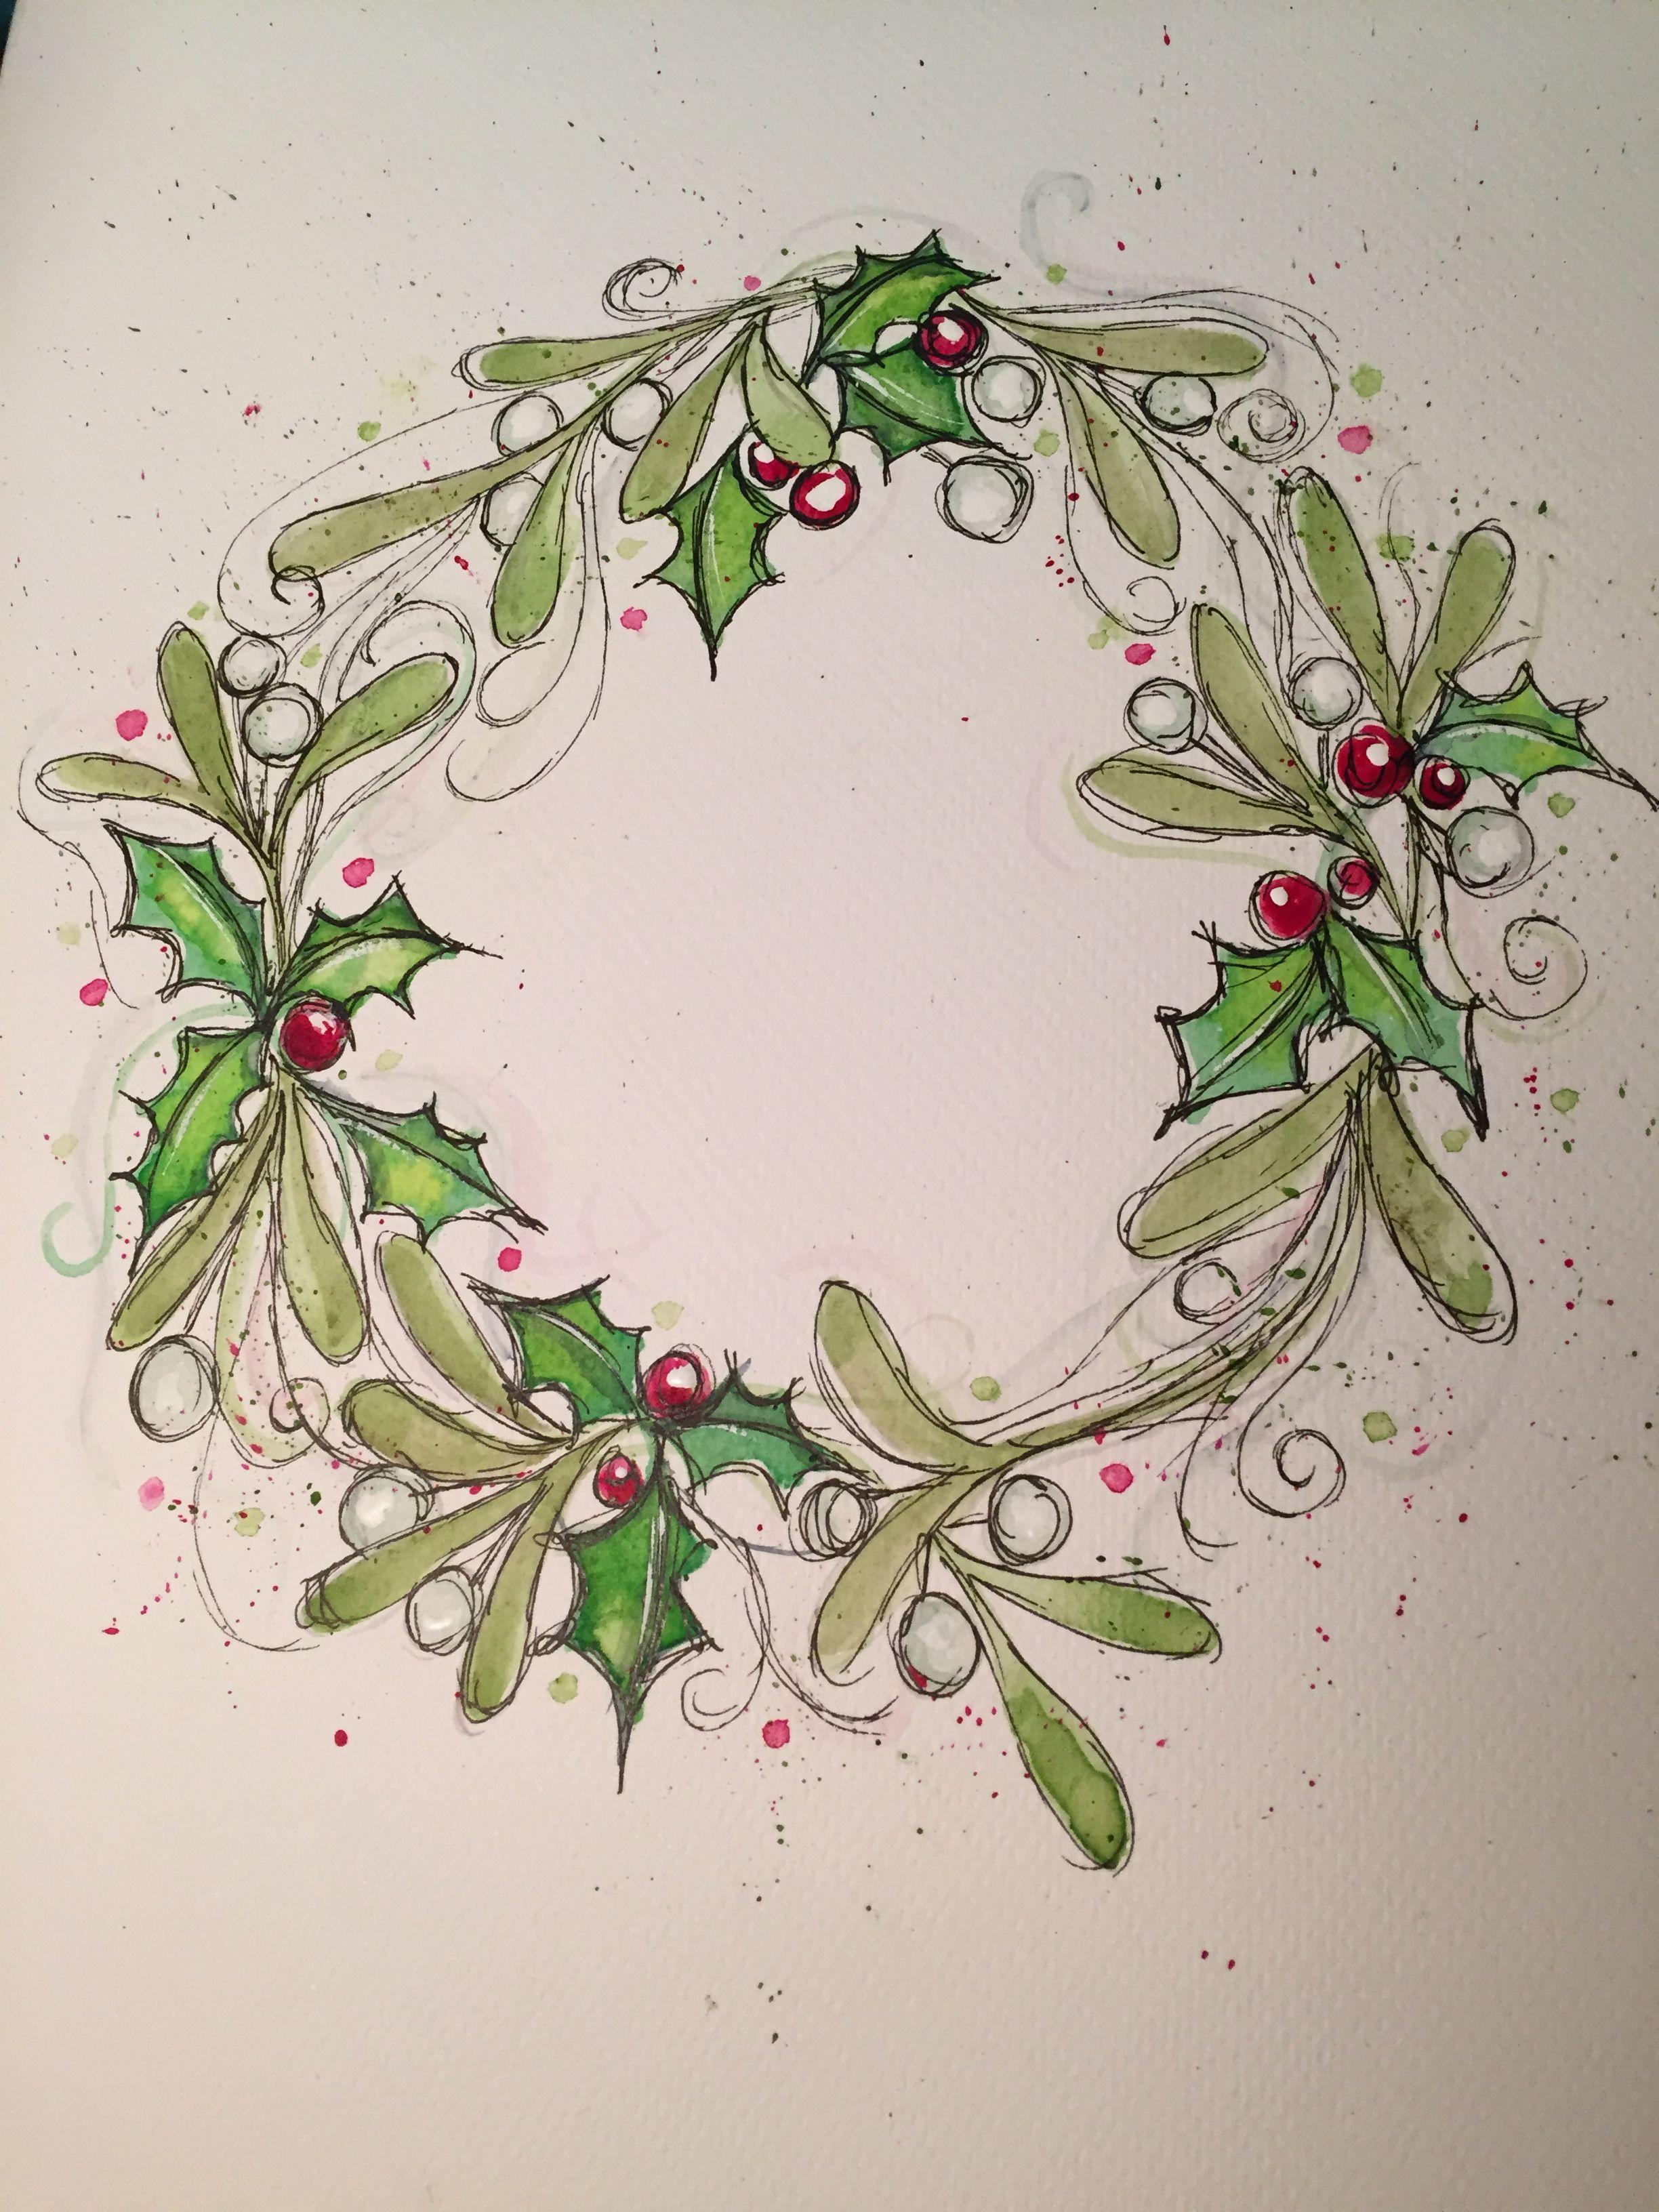 Watercolor Christmas card wreath Holly and mistletoe